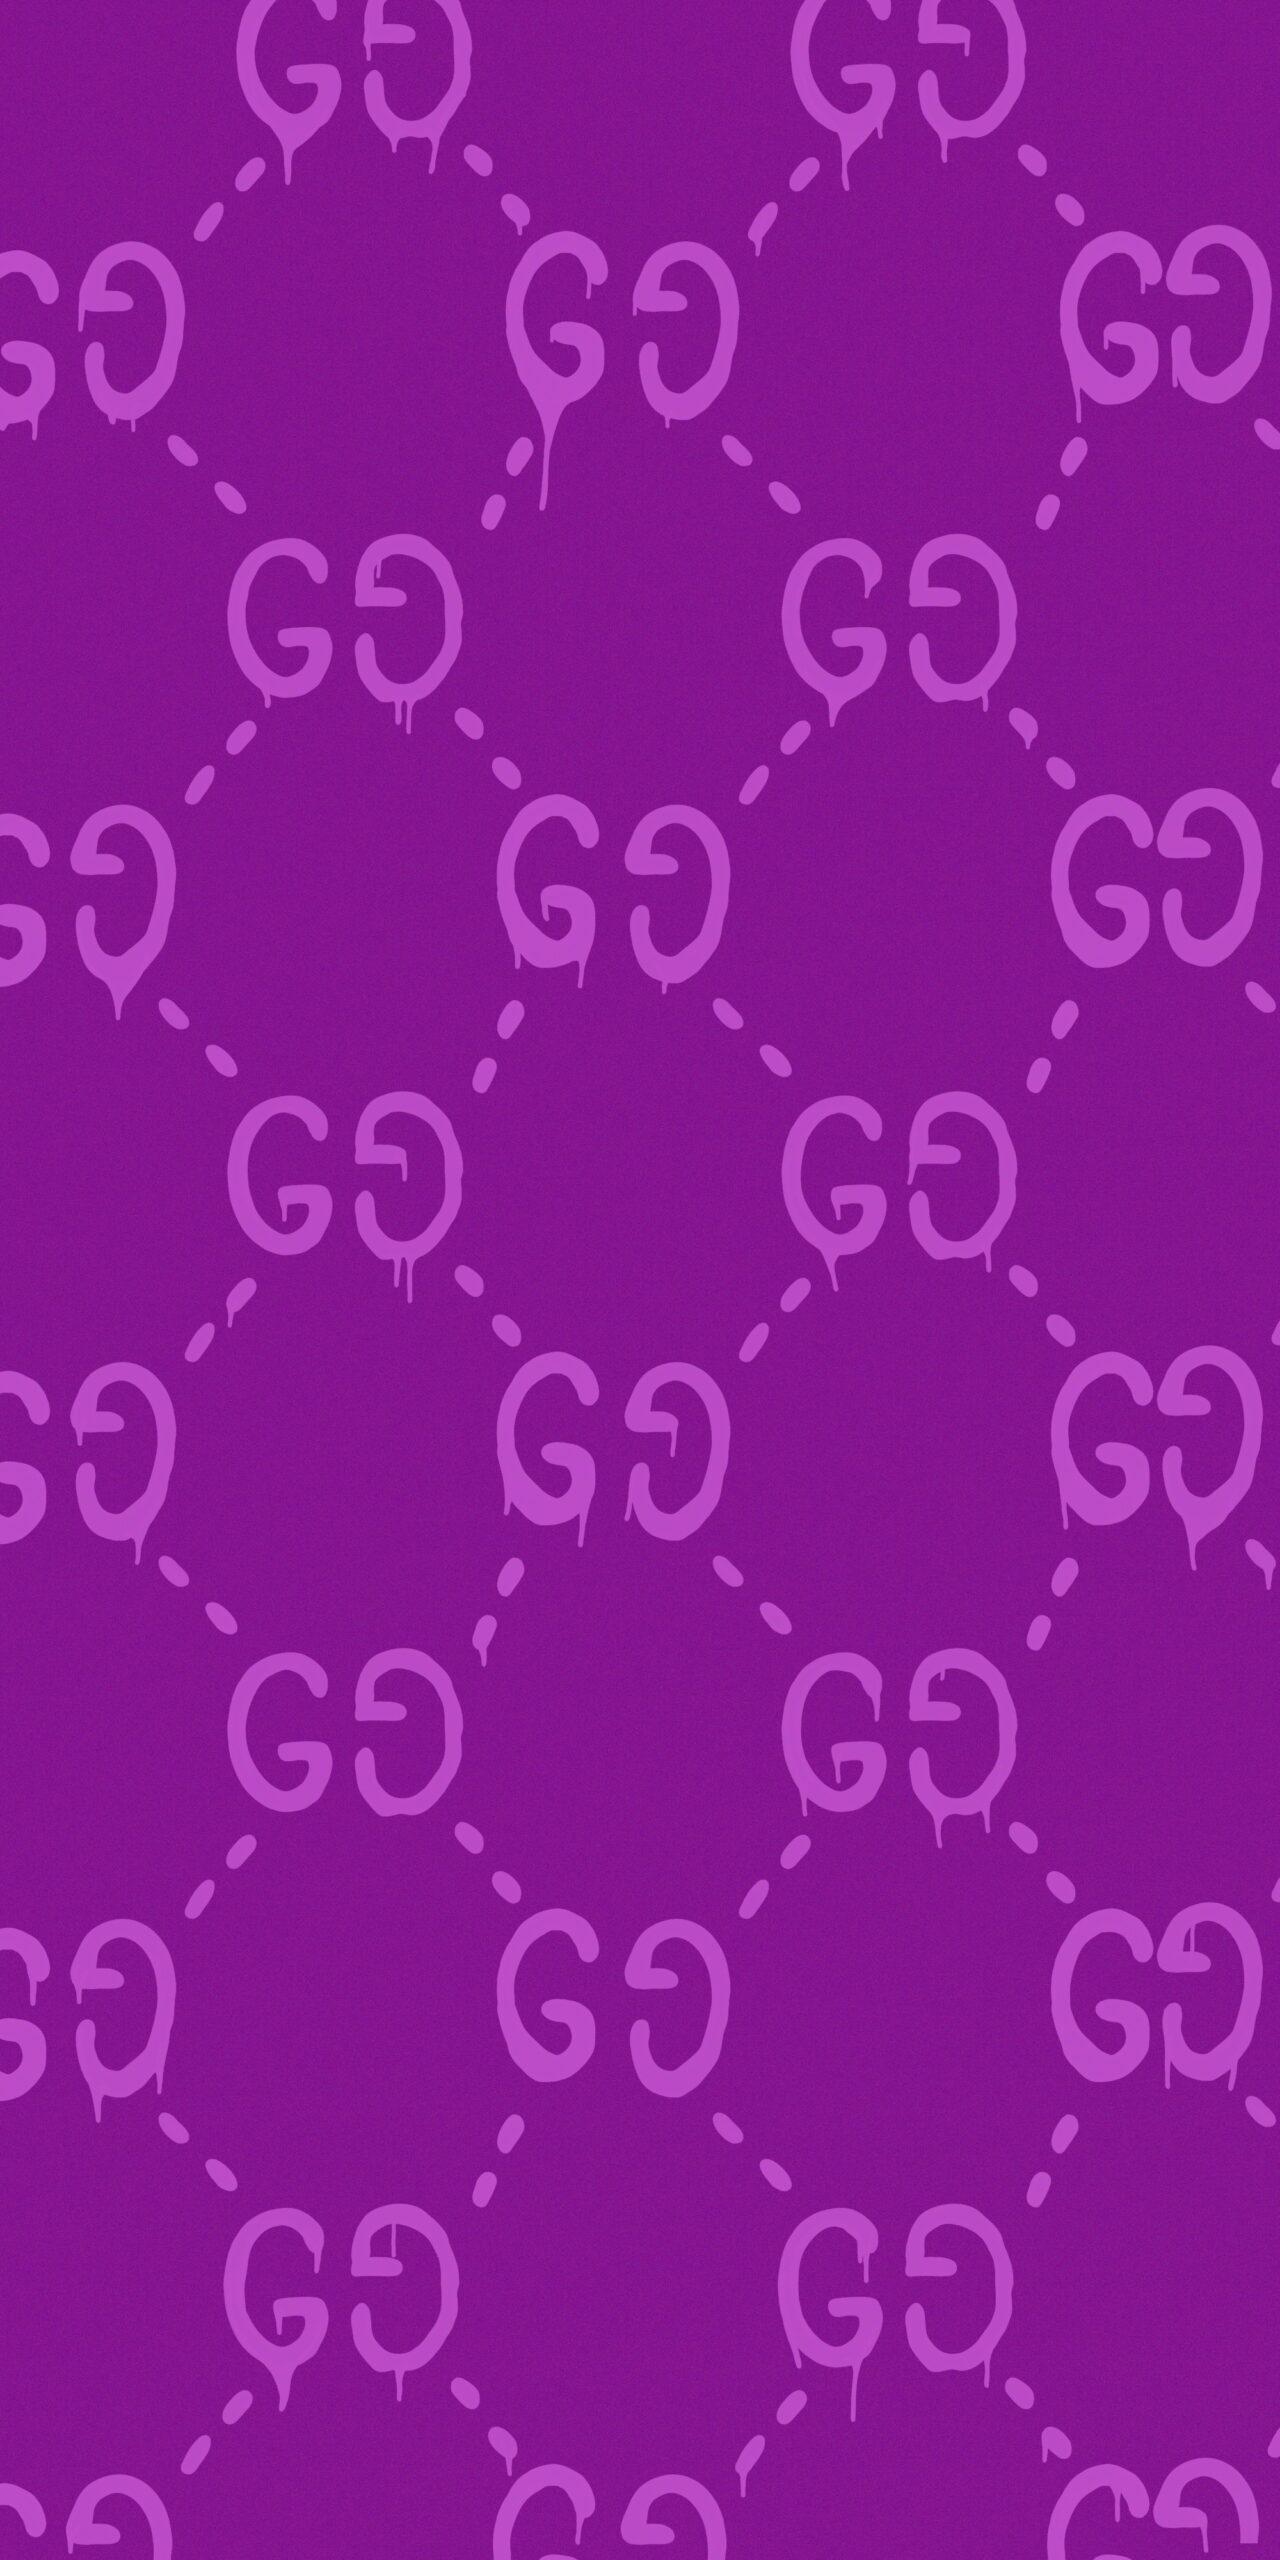 gucci ghost pattern purple background wallpaper